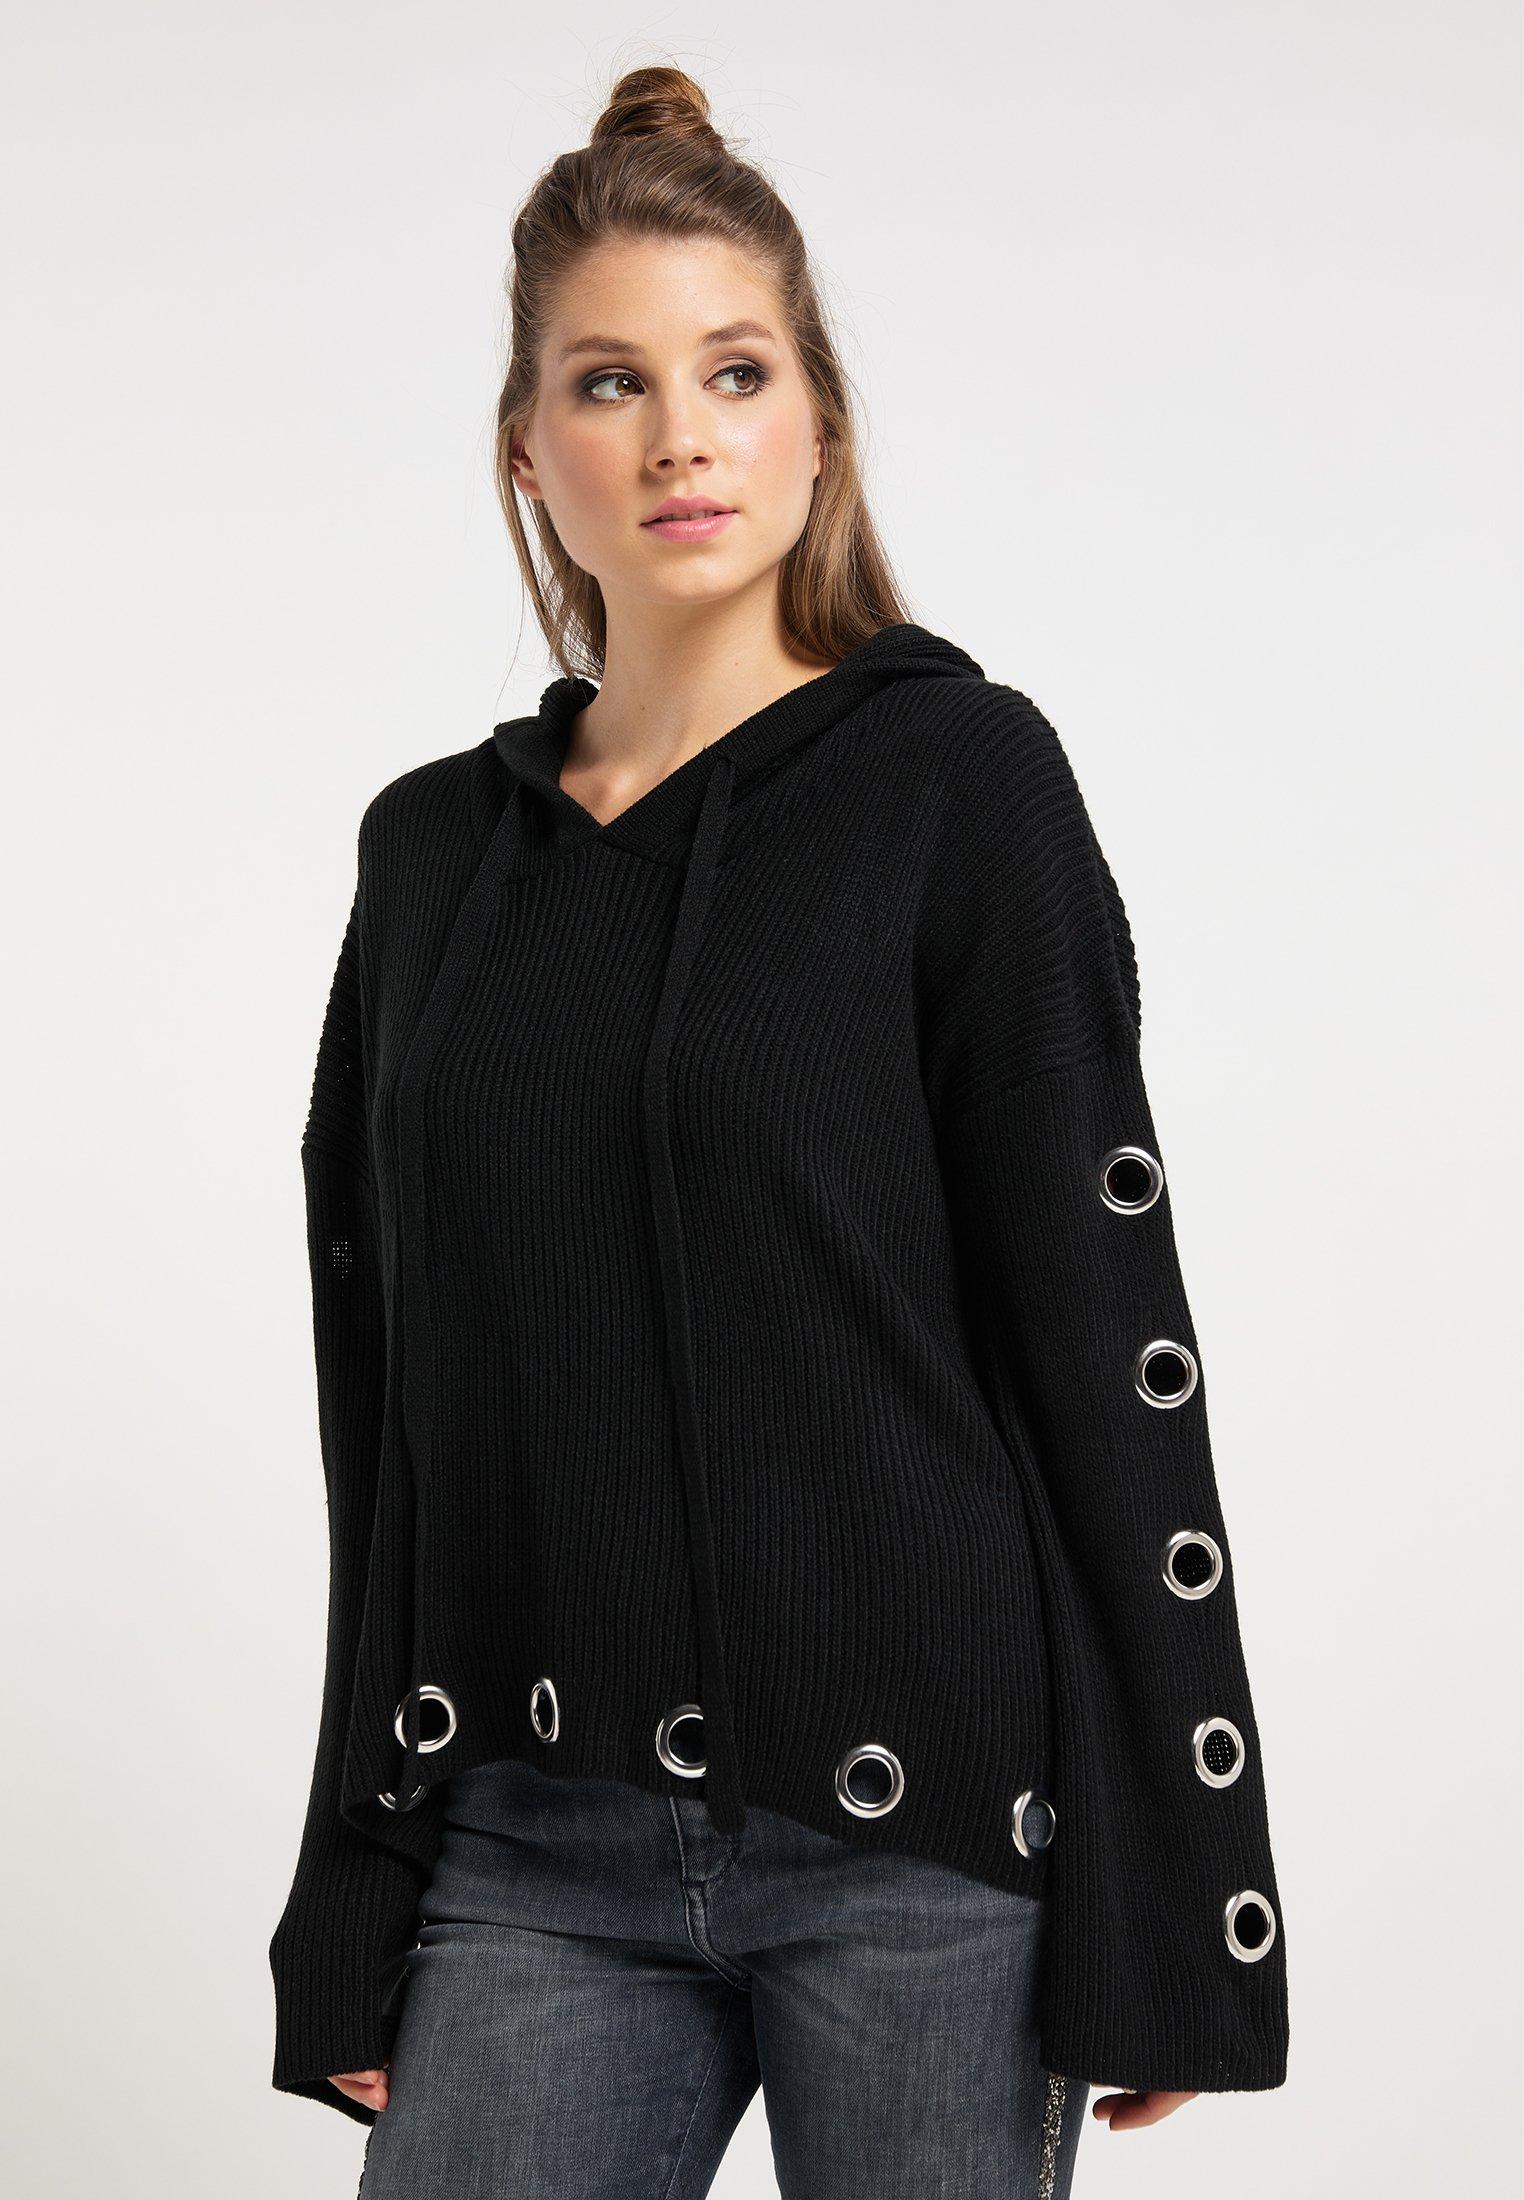 Mujer Jersey con capucha